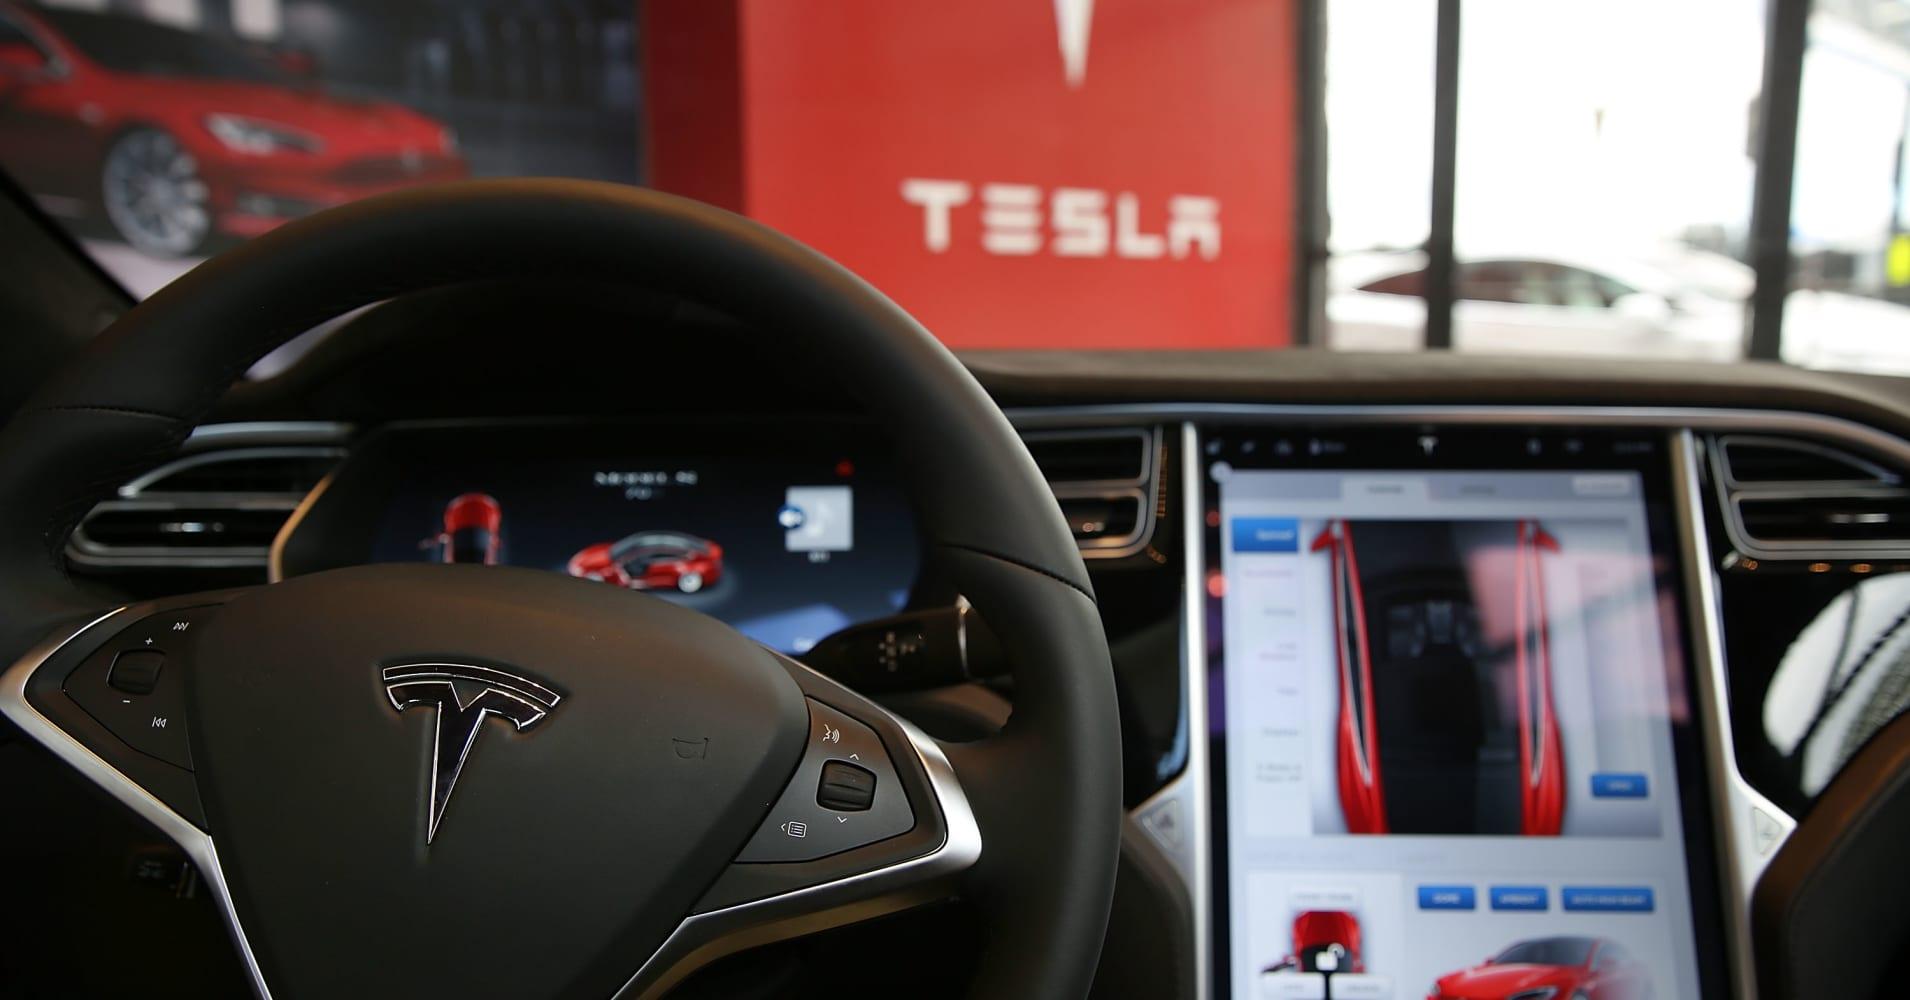 Elon Musk: Tesla Summon auto-parking upgrade probably available soon